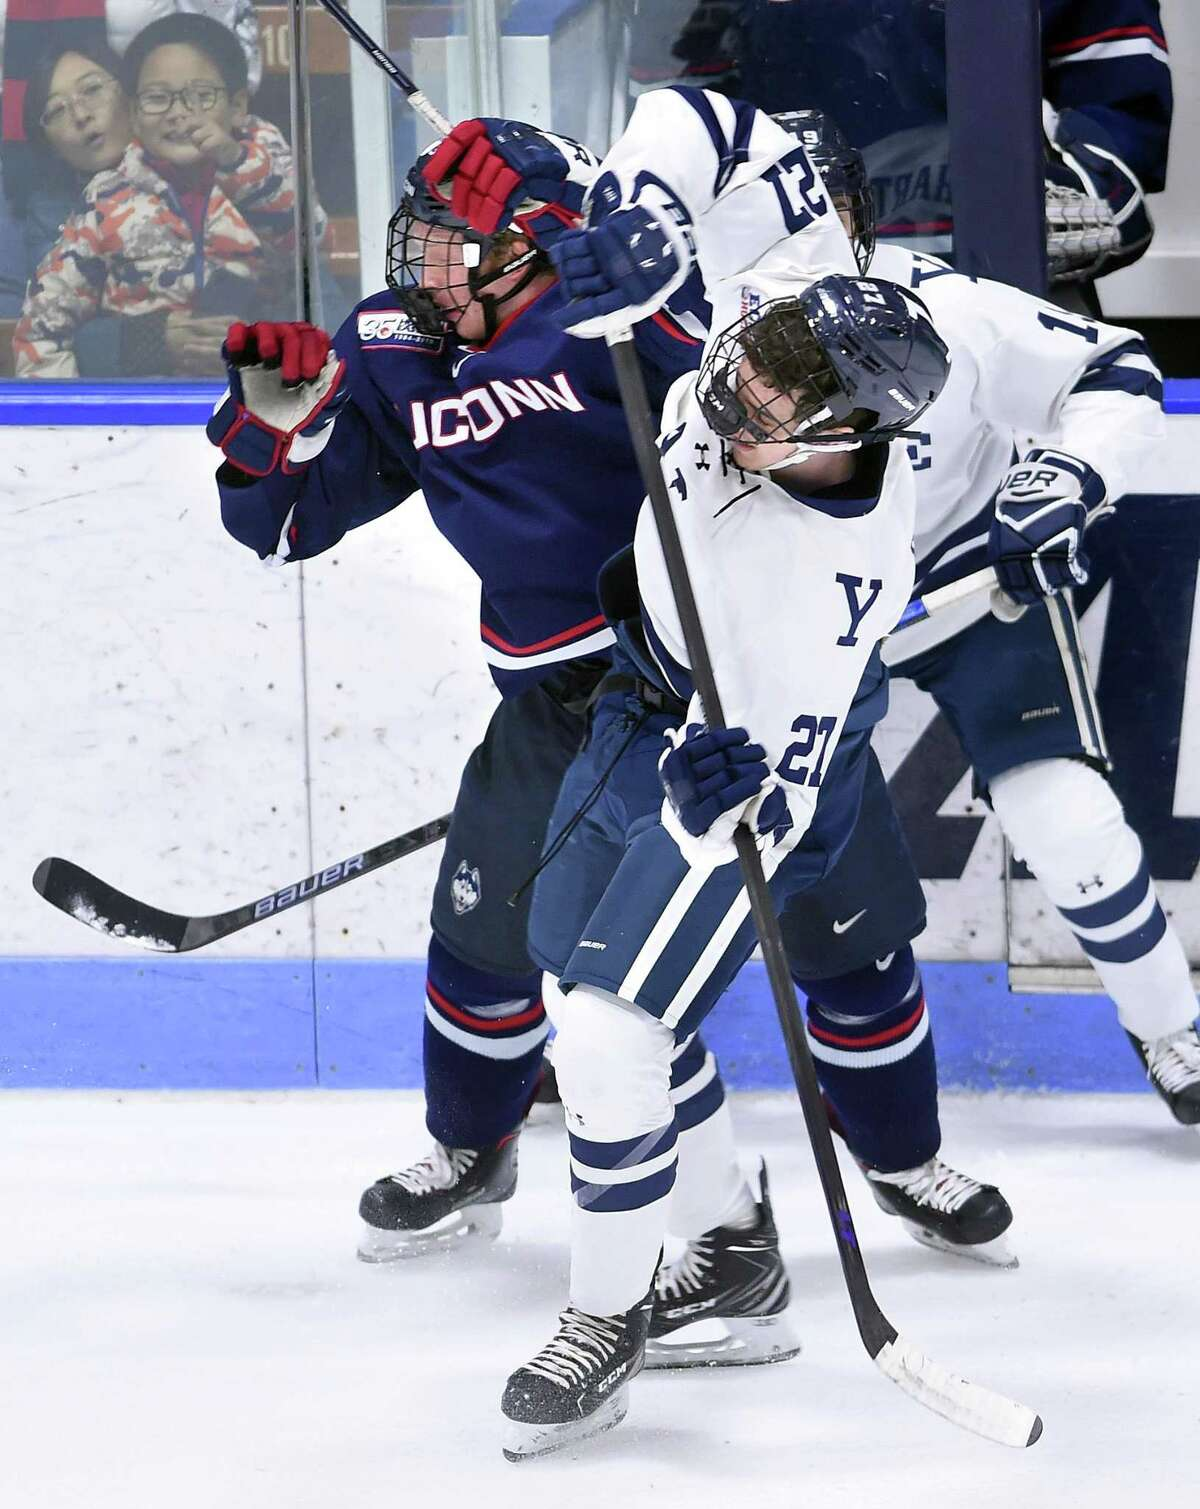 Rising senior Adam Karashik, a defenseman from Ridgefield, has been named captain of the UConn men's hockey team for next season, coach Mike Cavanaugh announced on Friday.